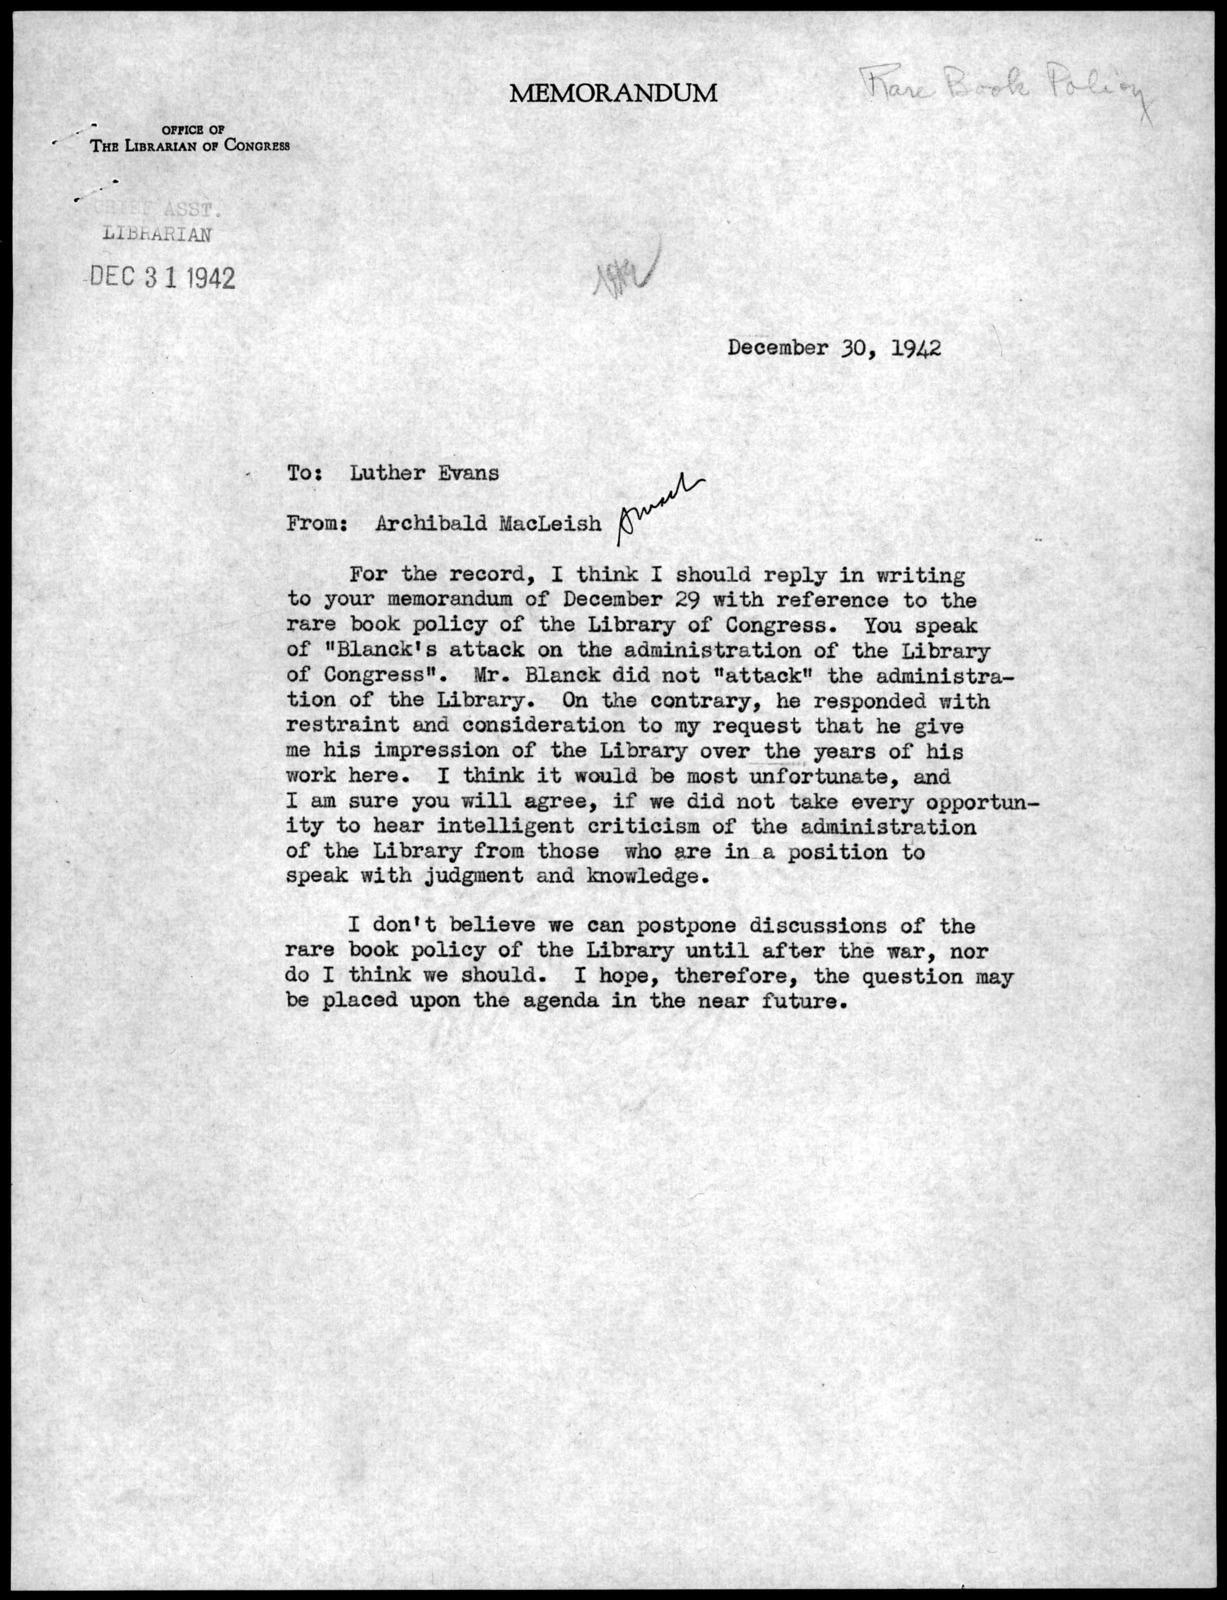 Memorandum from Archibald MacLeish to Luther Harris Evans, December 30, 1942